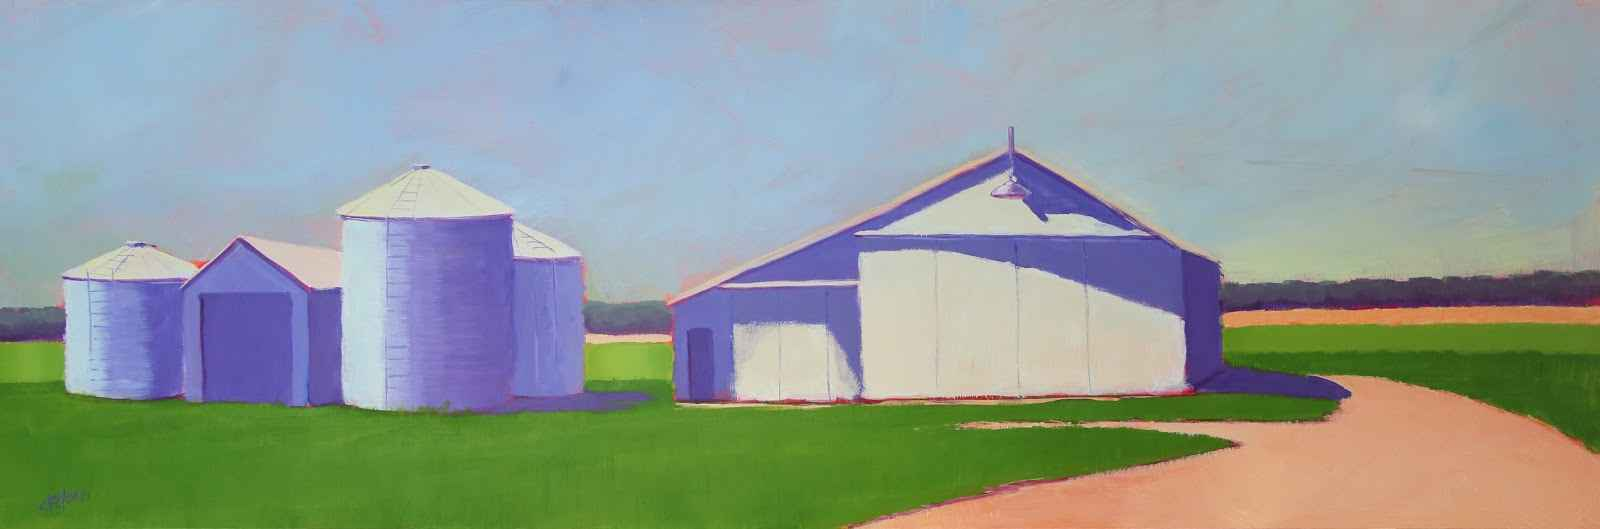 The Silo Farm